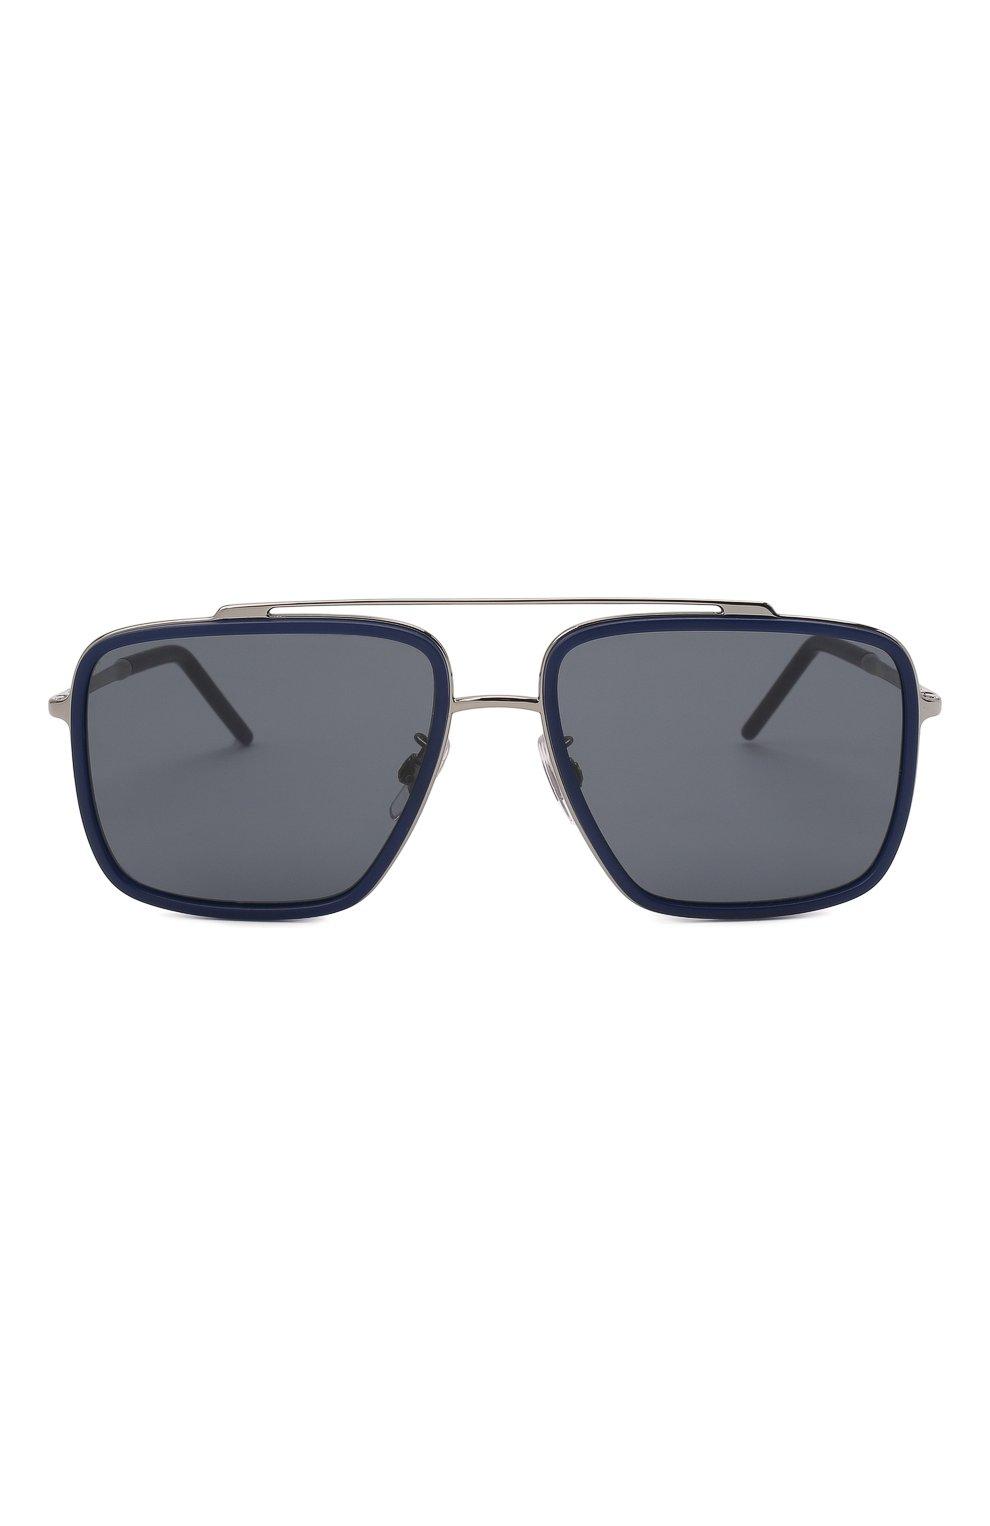 Мужские солнцезащитные очки DOLCE & GABBANA темно-синего цвета, арт. 2220-04/80 | Фото 3